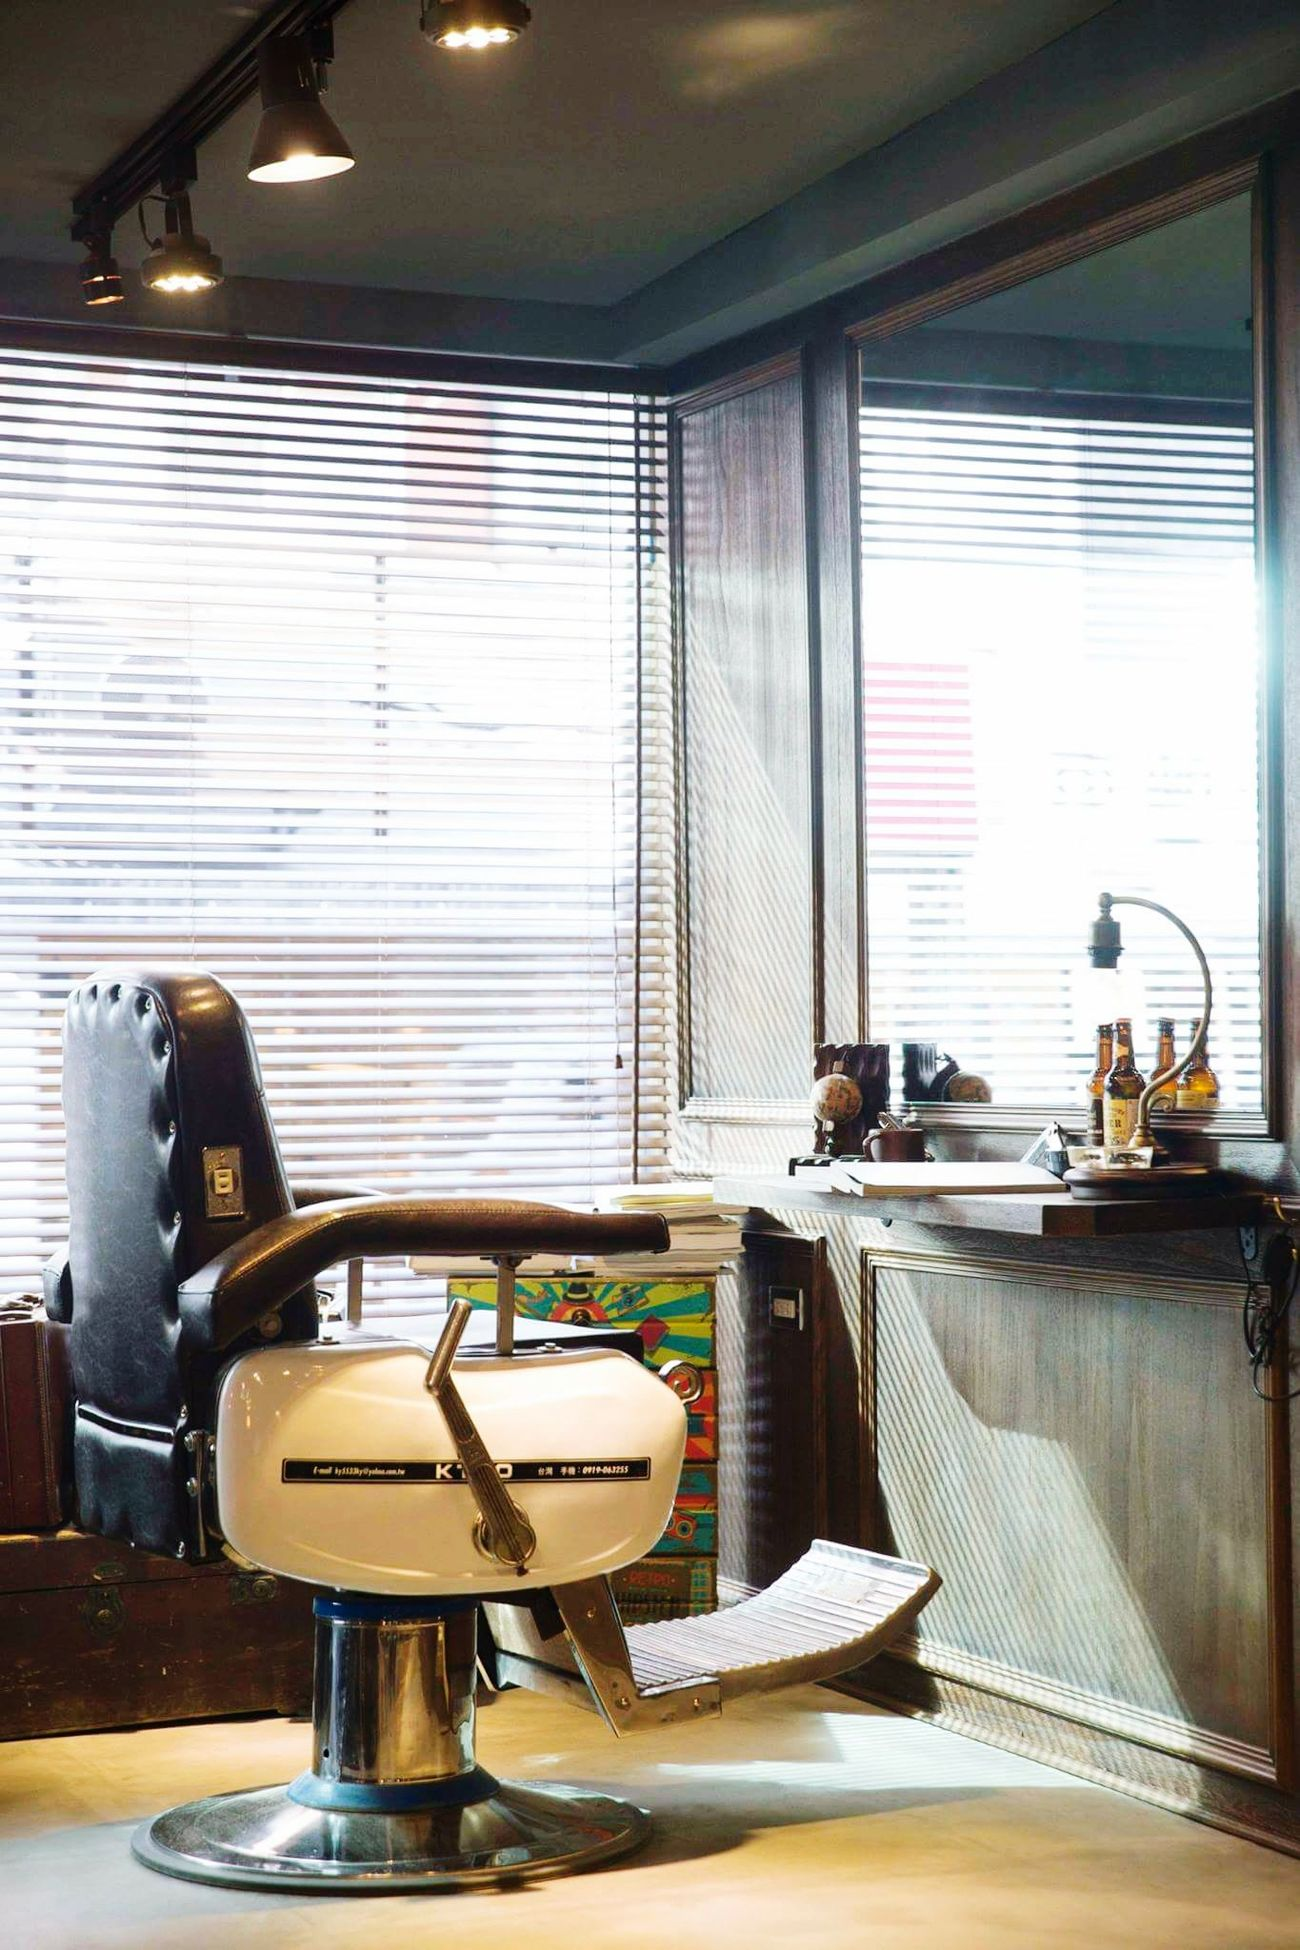 My working place💈https://www.instagram.com/edgarsunhair/First Eyeem Photo Barbershop Barberlife Mensfashion Menstyle Menshairstyle GQ Oster Undercut Undercuthair Slicked 髮型設計 Edgarsunhair Hairsalon Hairstyle Hair Haircut Hairstylist